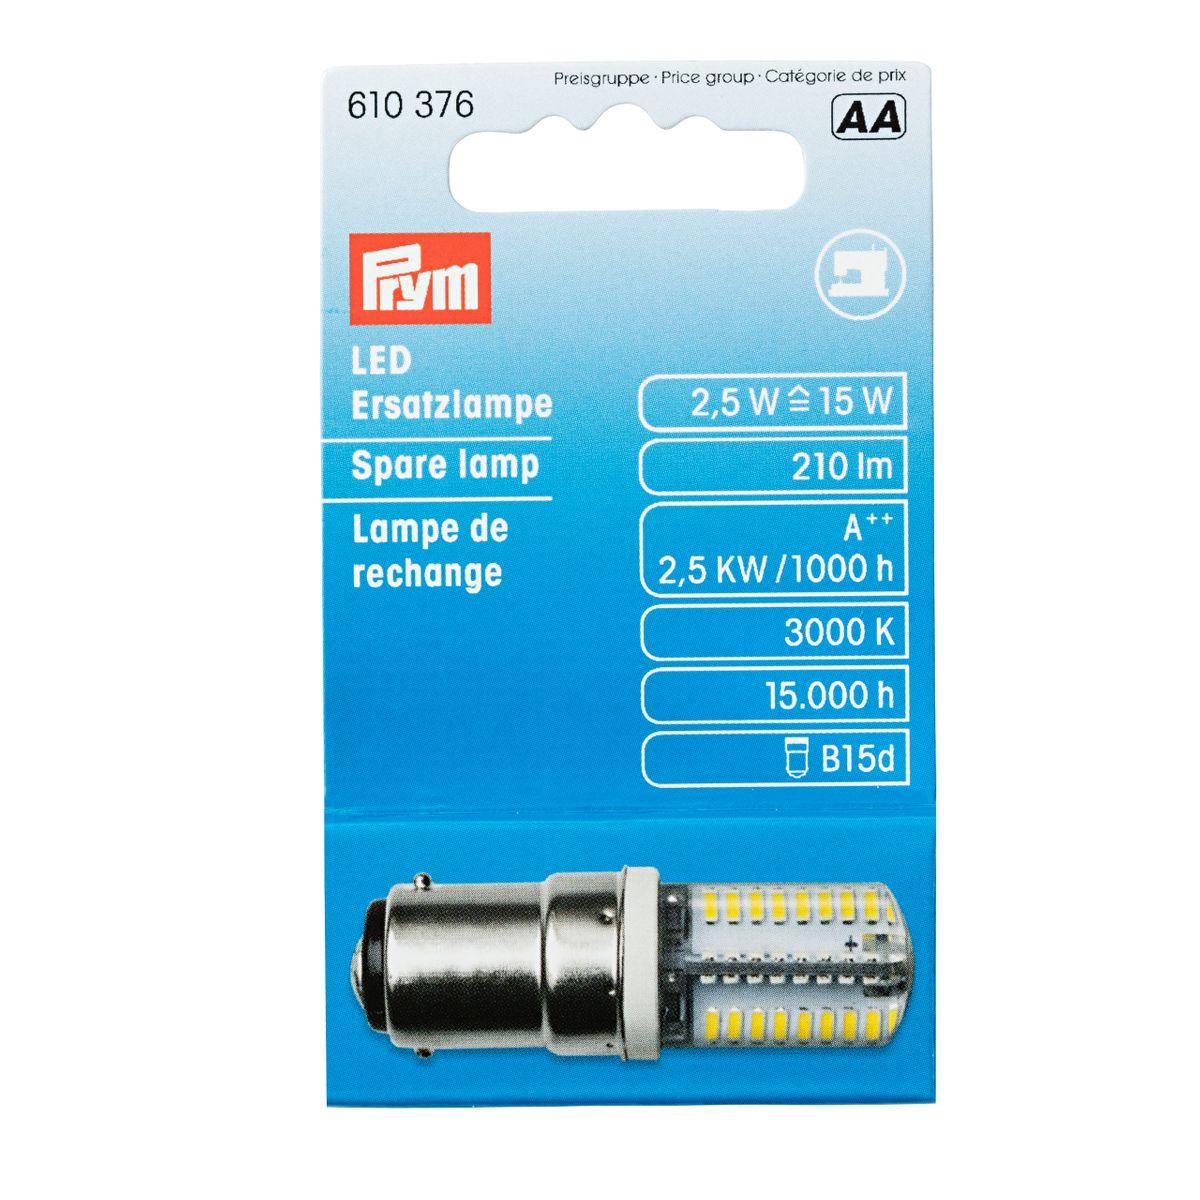 Prym LED Ersatzlampe für Nähmaschine Bajonett